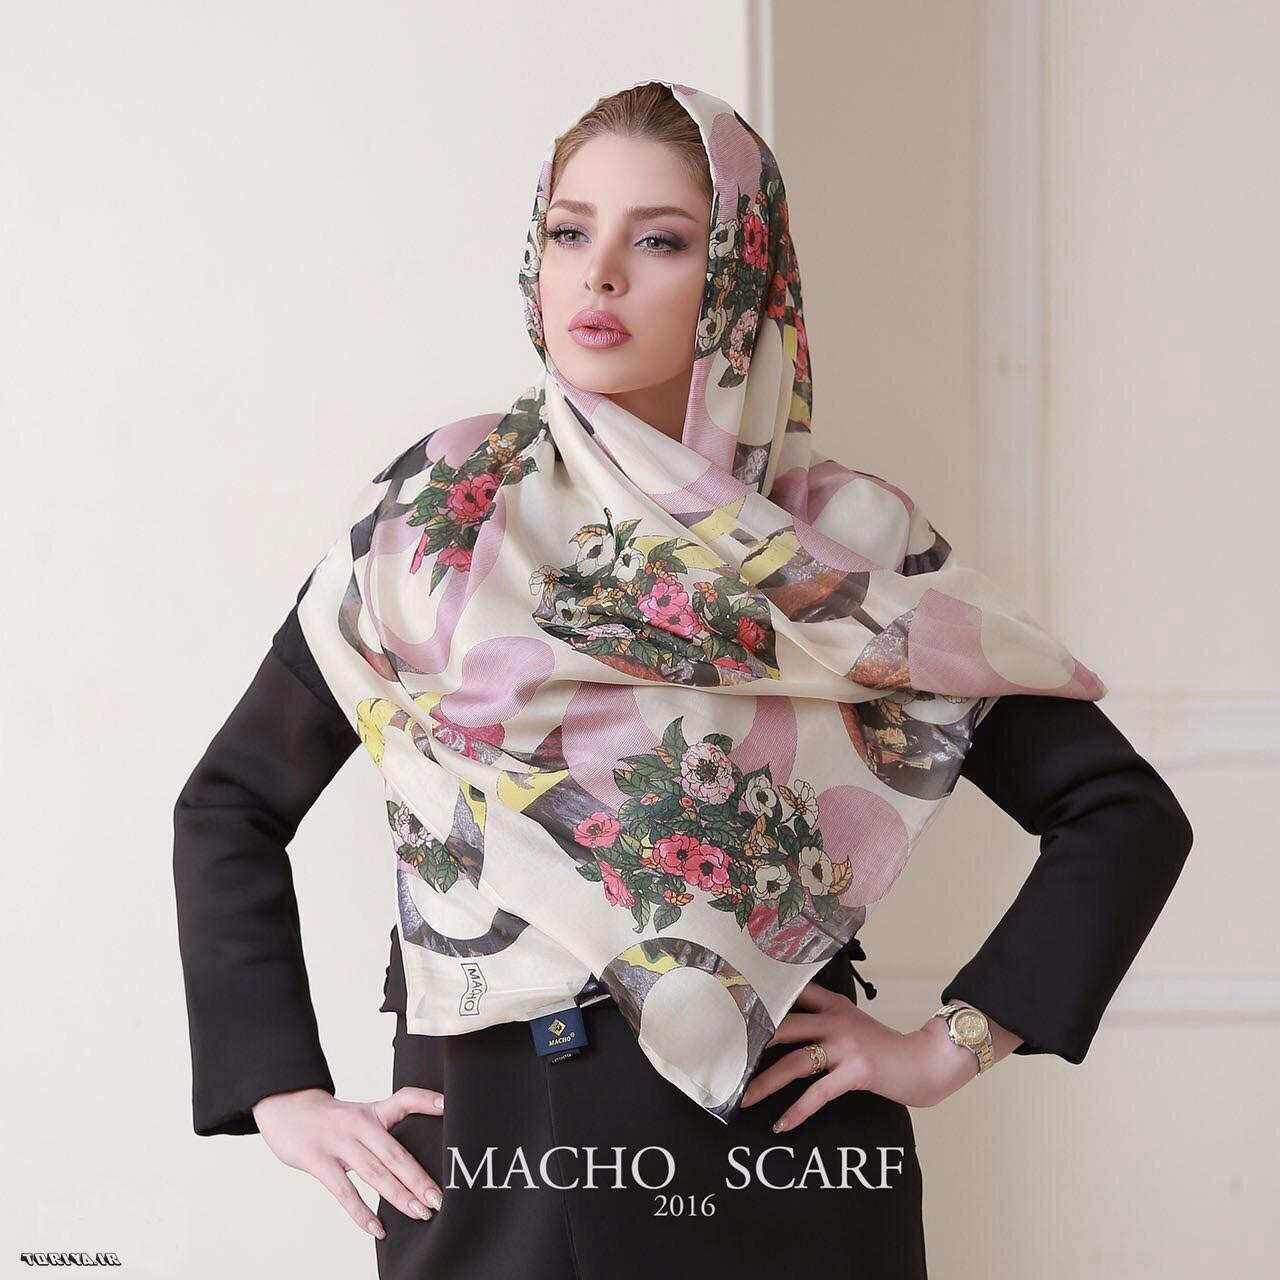 مدله شال و روسری بهاری